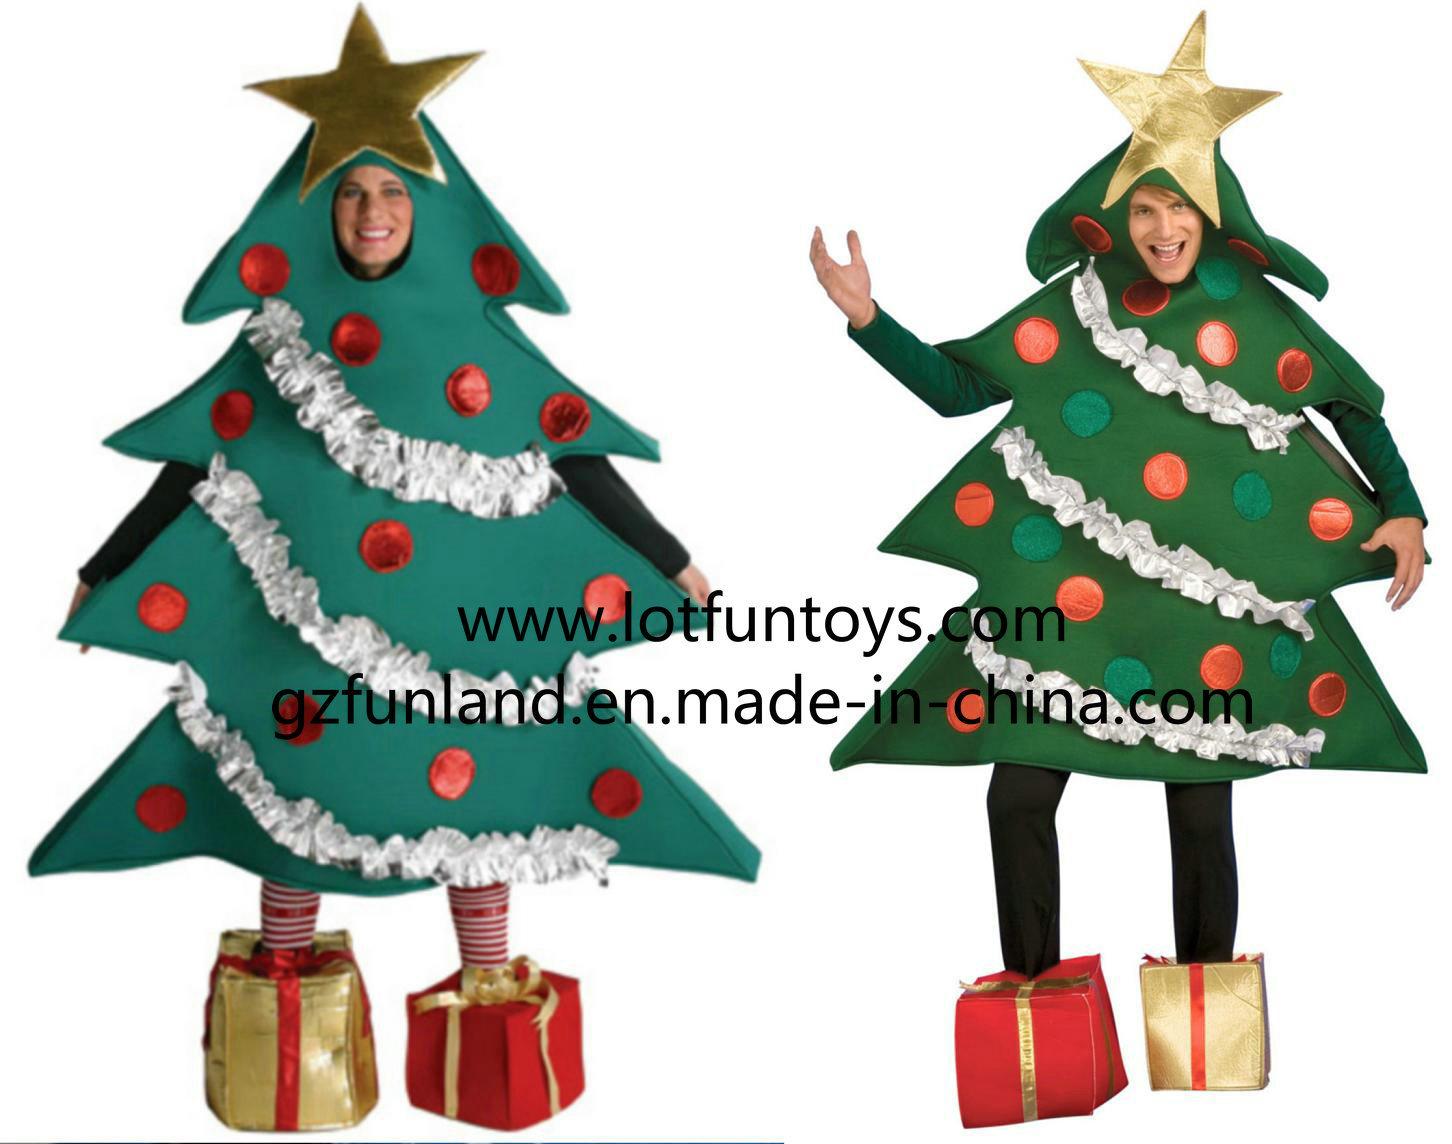 Customized Christmas Tree Mascot Costume